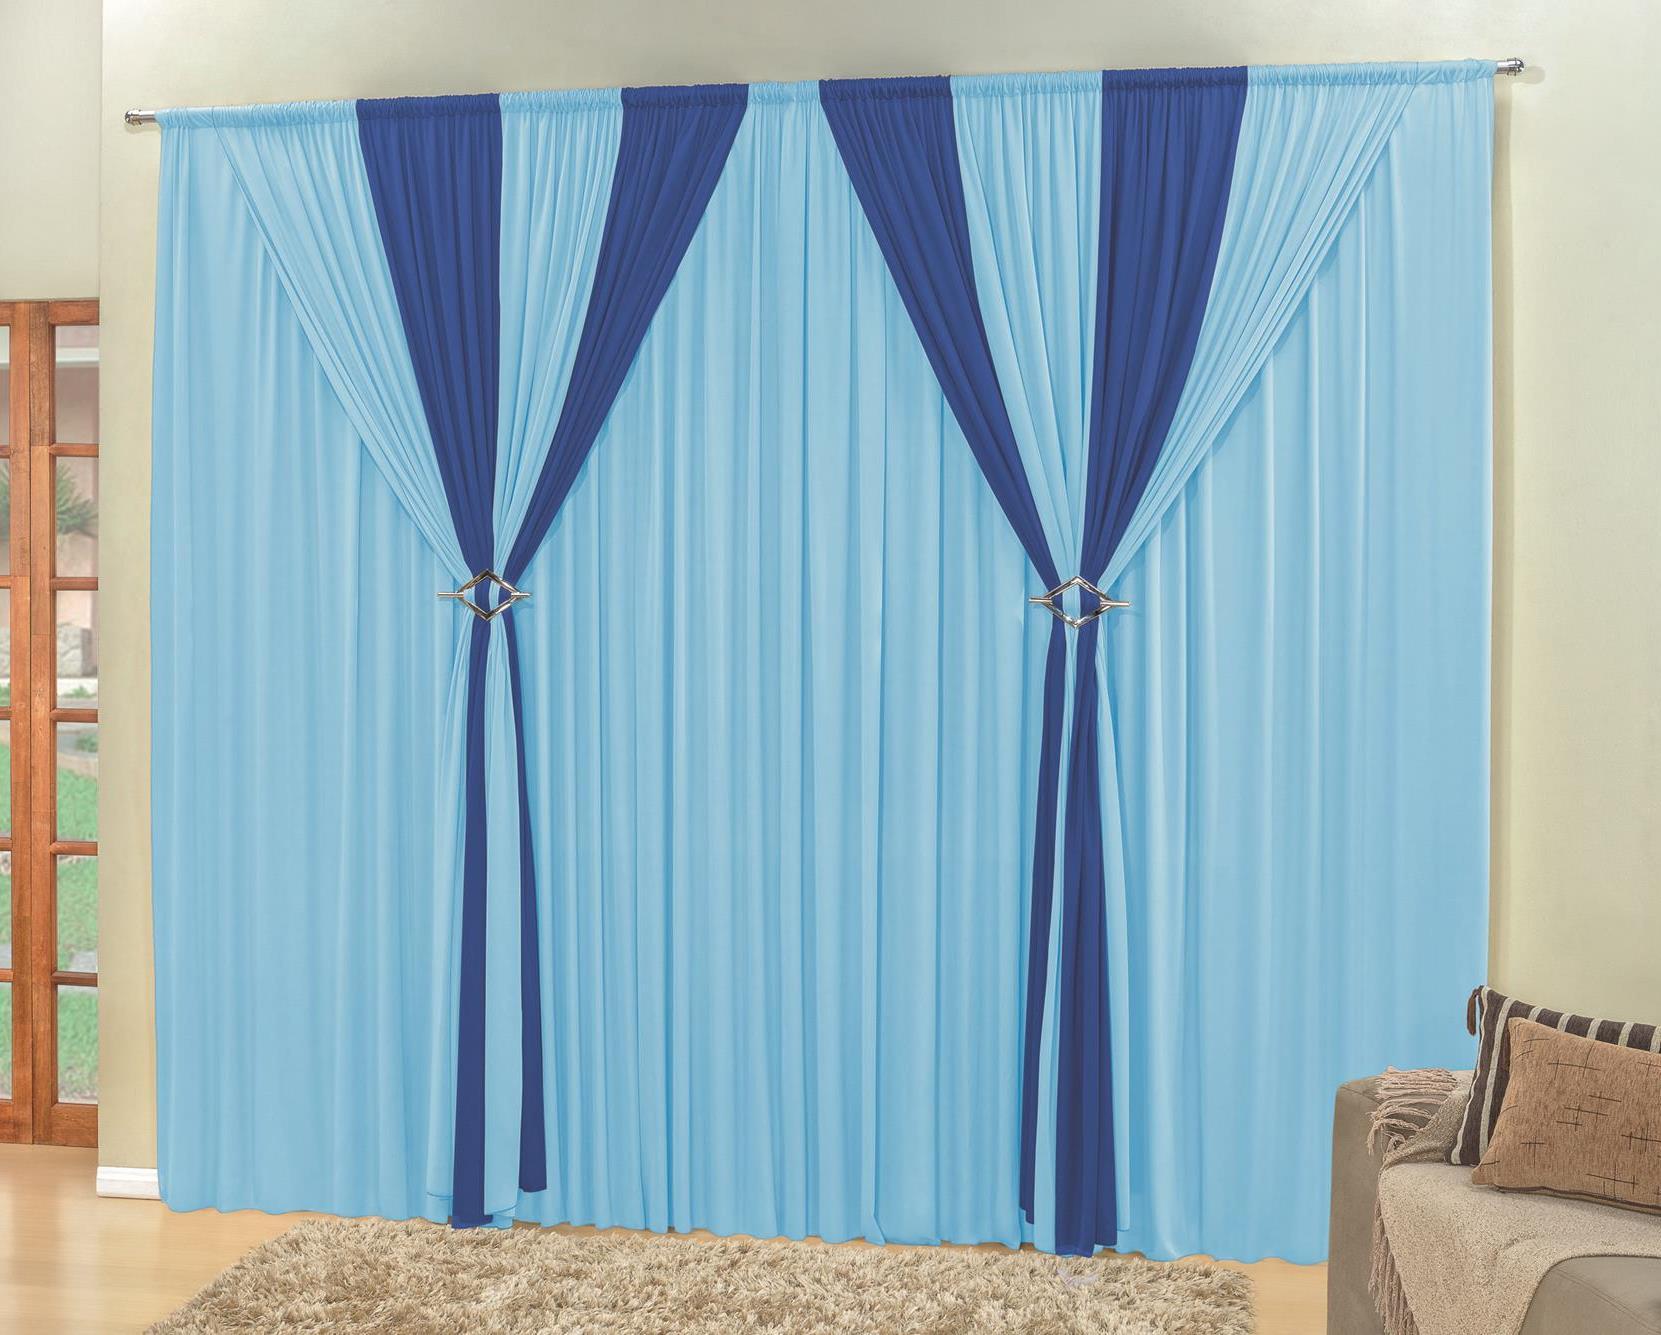 Cortina Rafaela 3m Sala Quarto De Ibitinga Var O Simples -> Cortinas Para Sala Azul